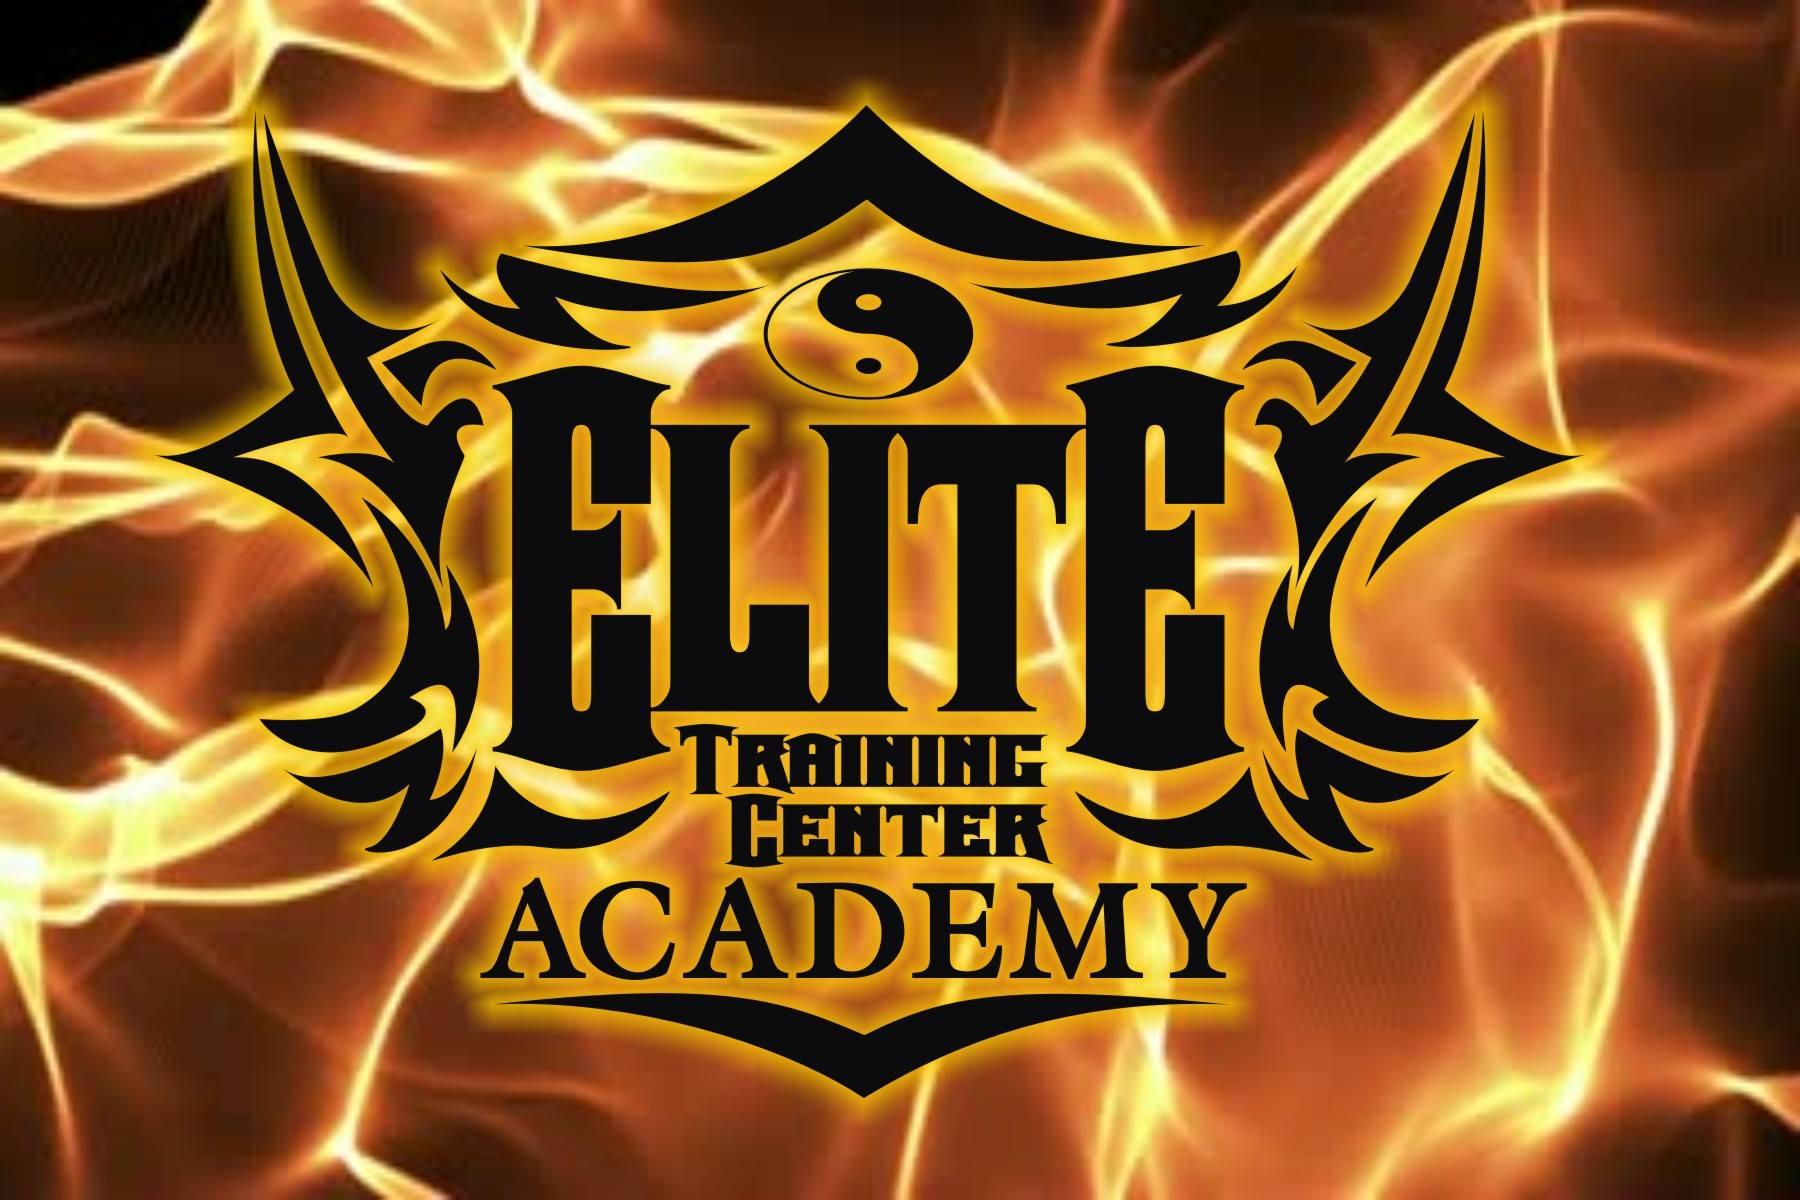 Elite Training Center Academy